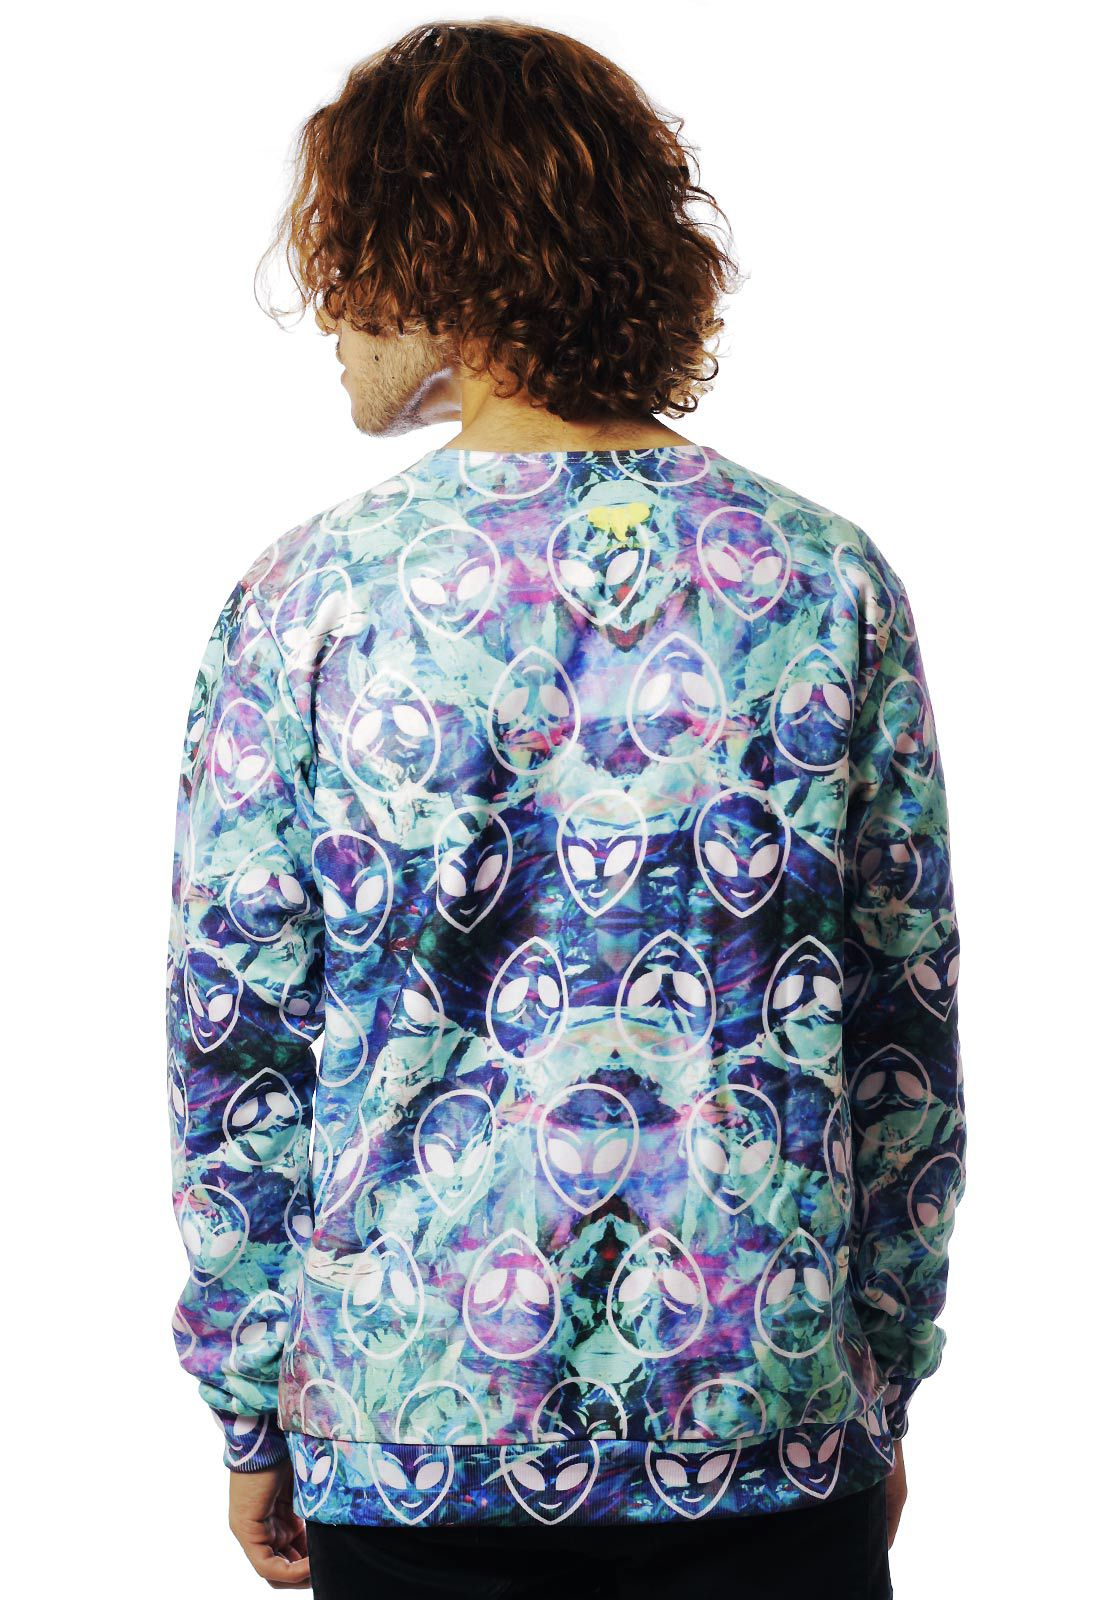 Blusa Moletom Tumblr Estampado ElephunK Full Print Unissex Aliens